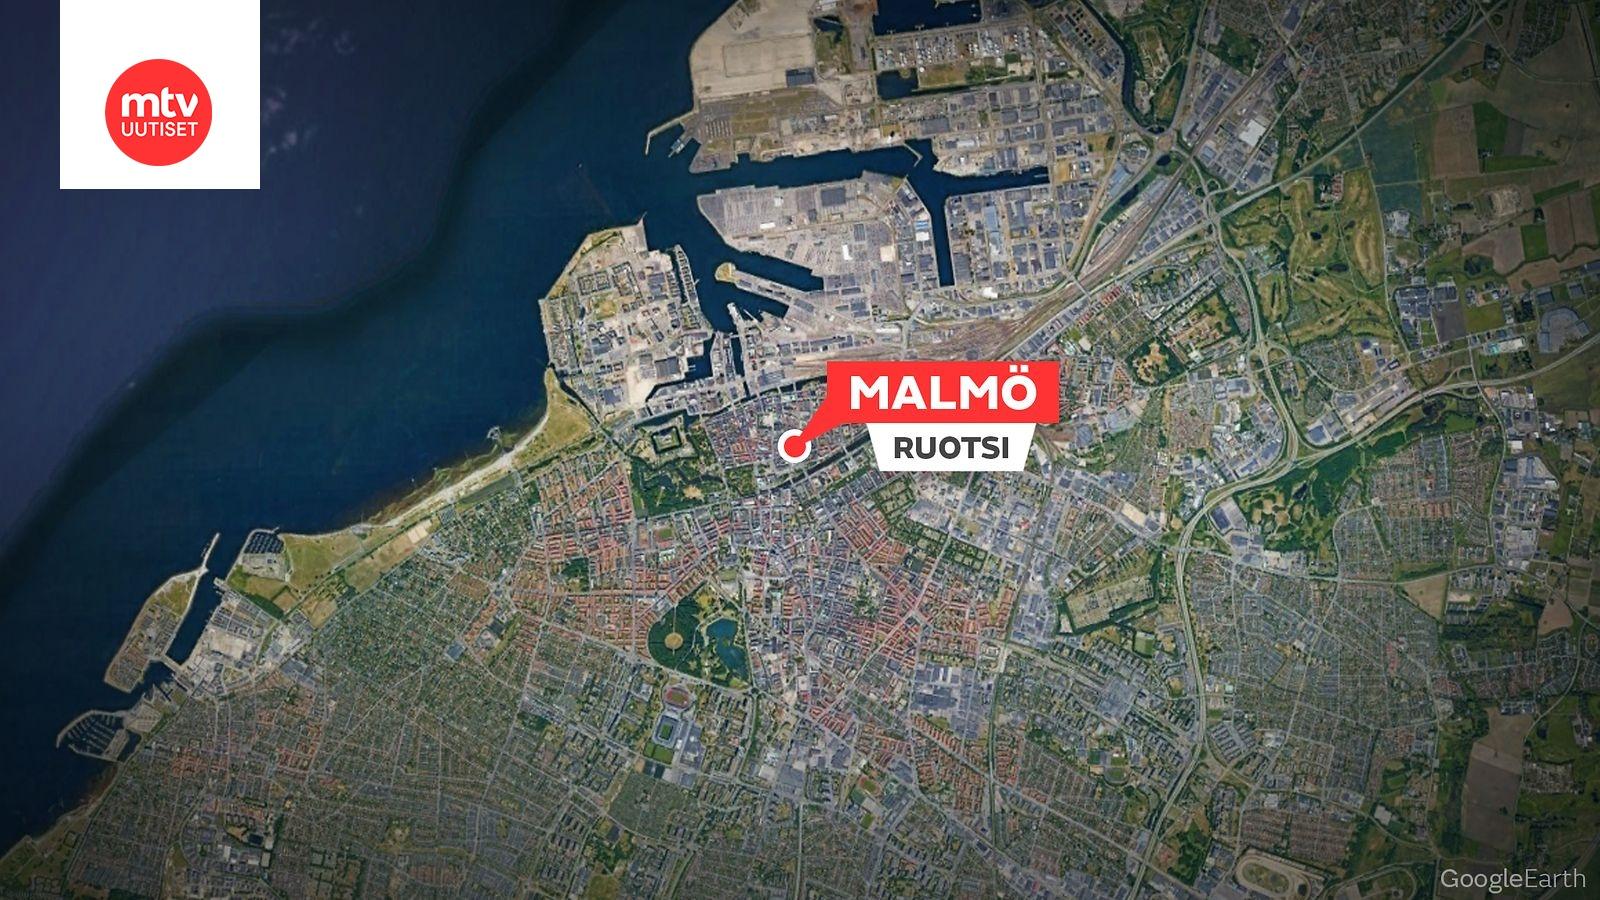 Poliisi Ampui Uhkaavasti Kayttaytynytta Miesta Malmon